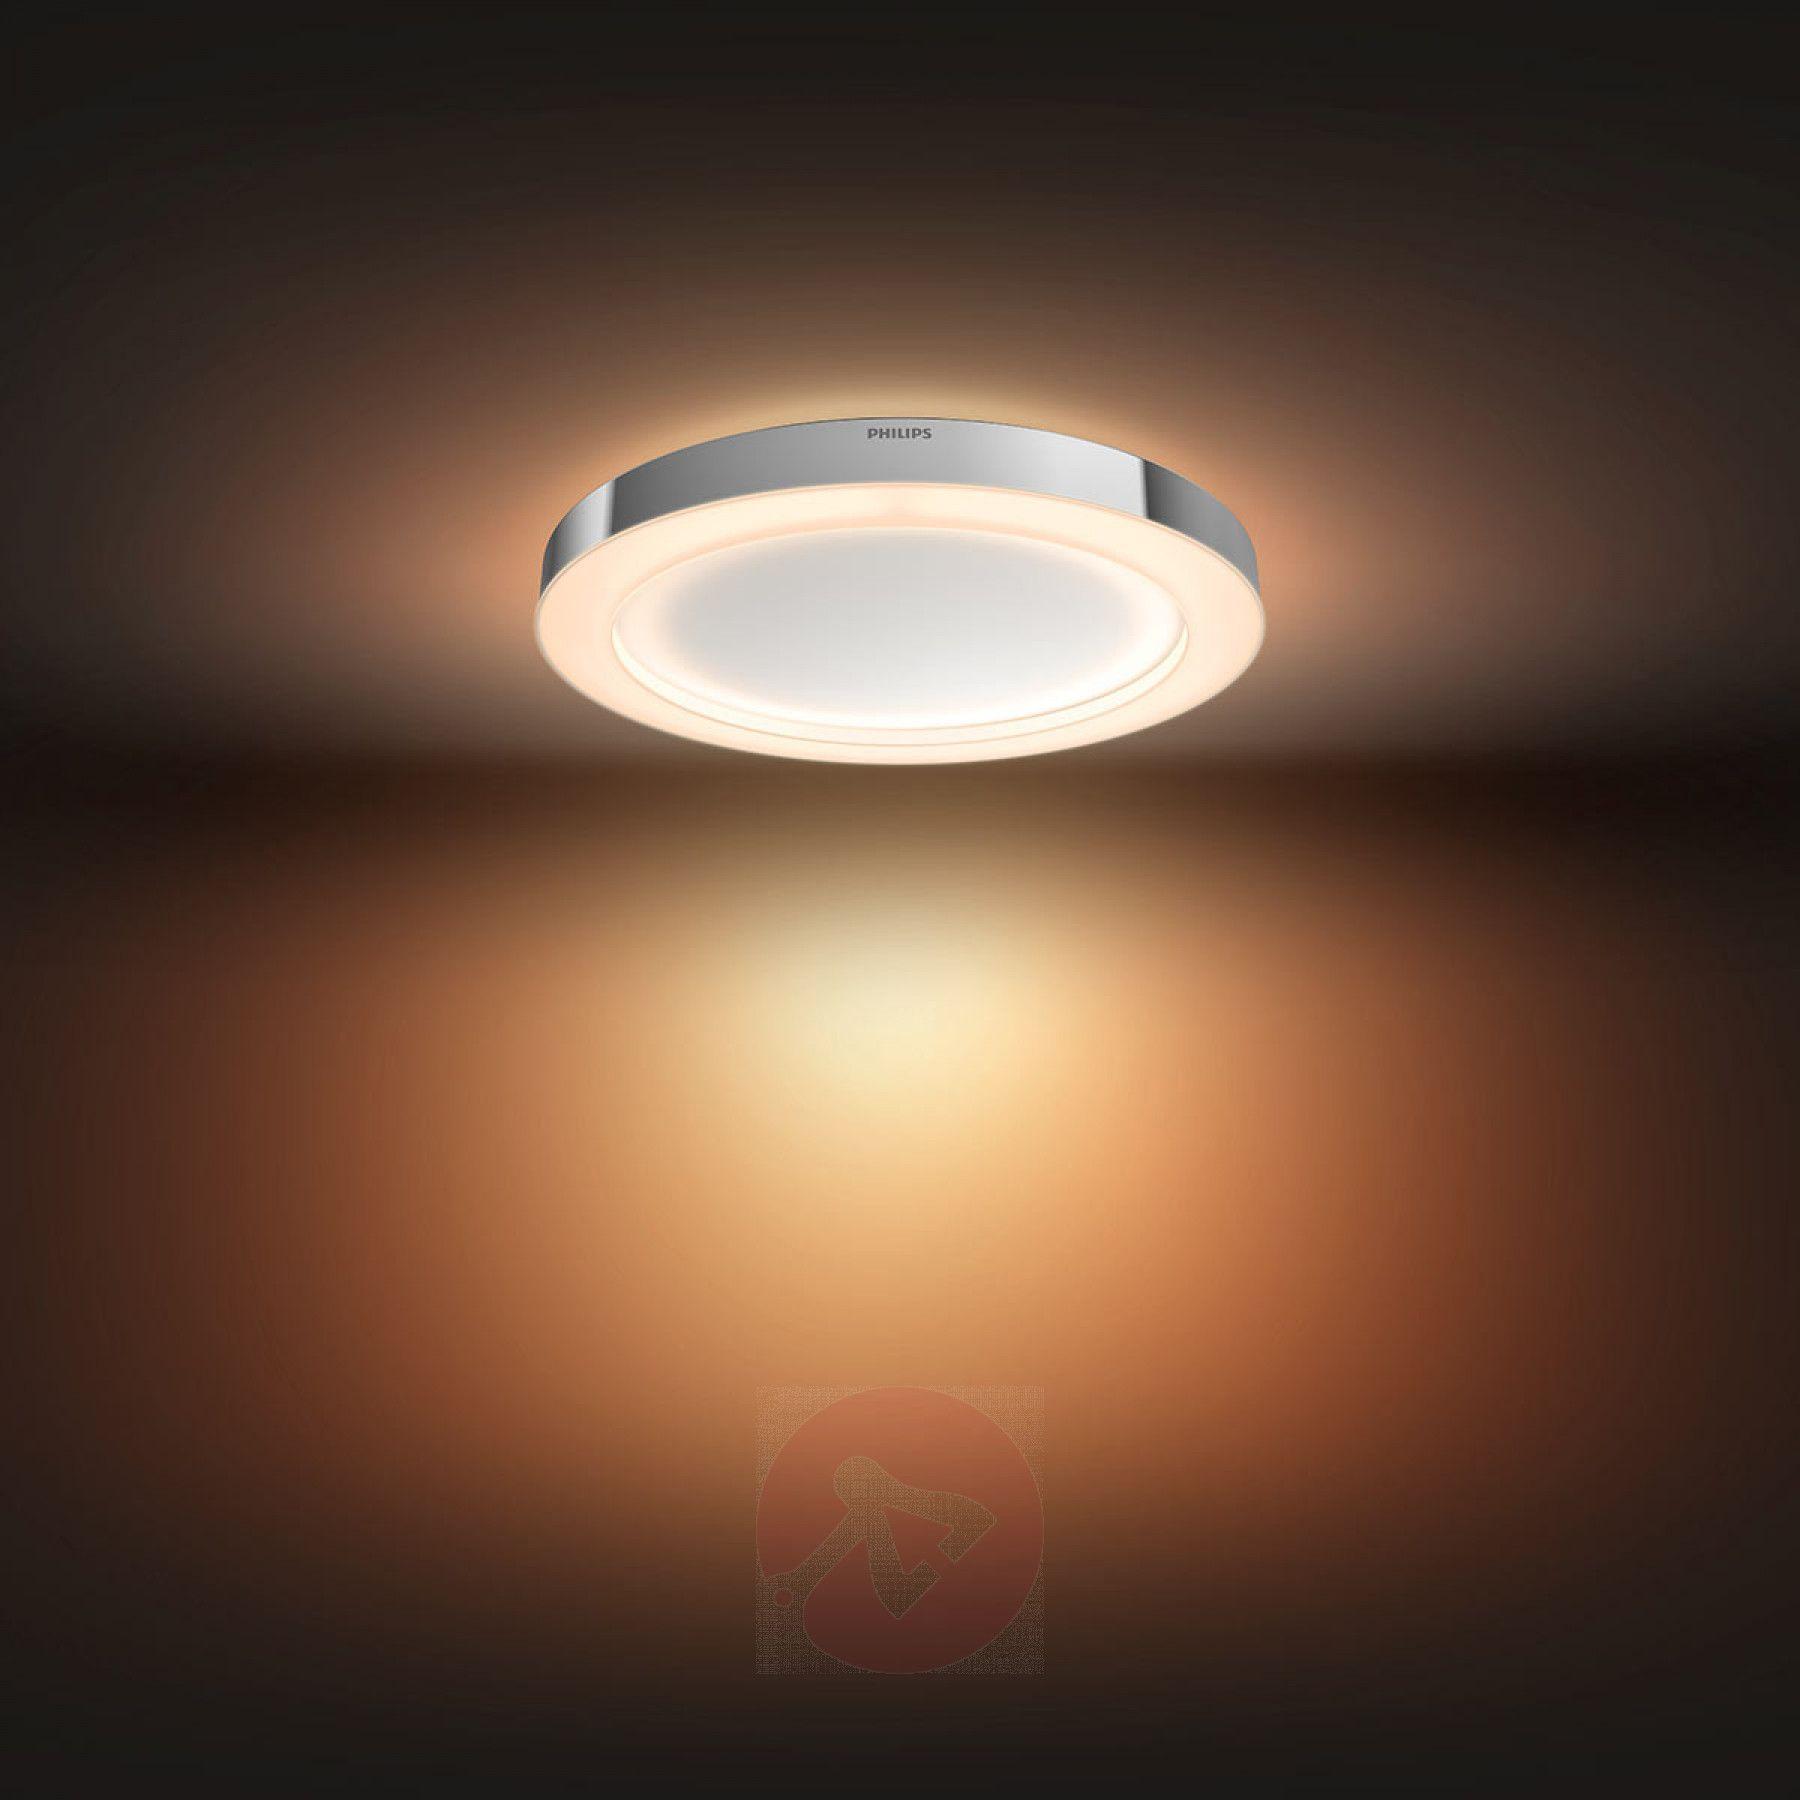 Philips Hue White Ambiance Adore Bad Deckenlampe Schone